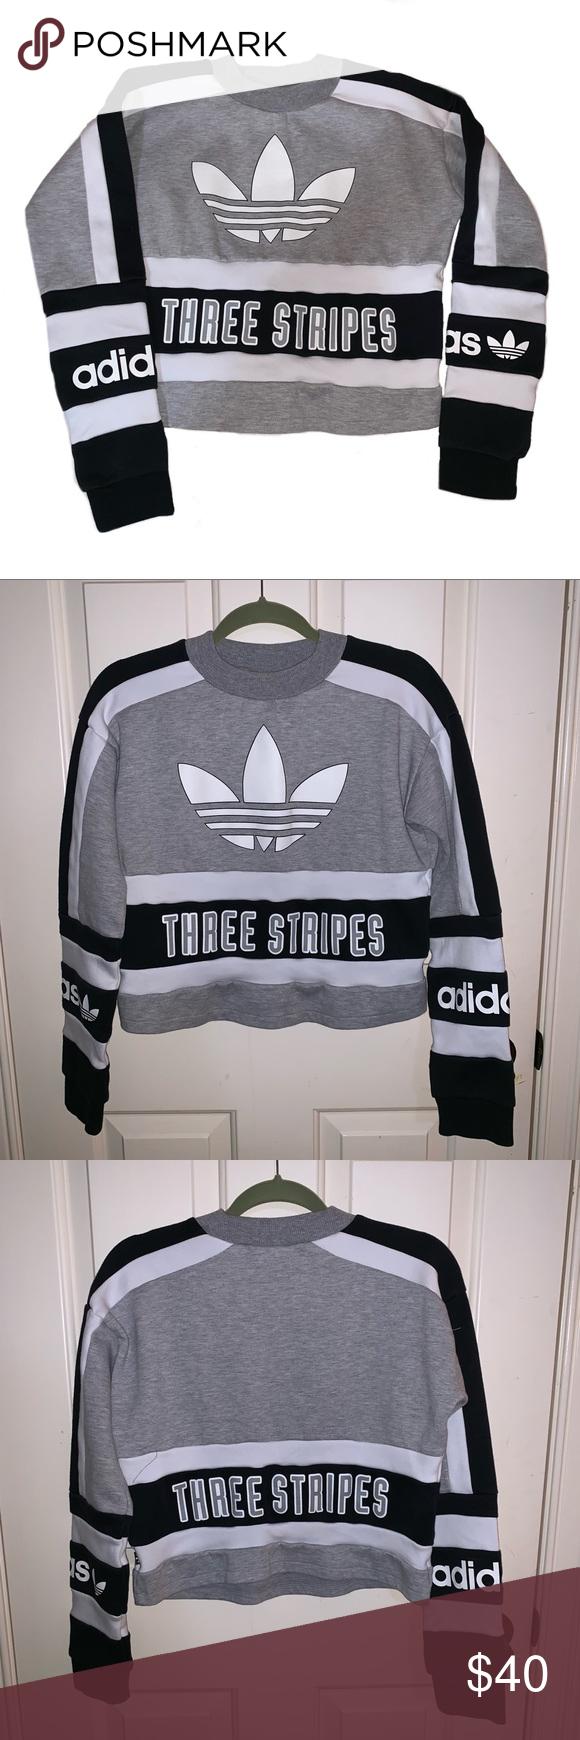 Adidas Three Stripes Cropped Crew Neck Adidas Three Stripes Stripes Pacsun Adidas [ 1740 x 580 Pixel ]